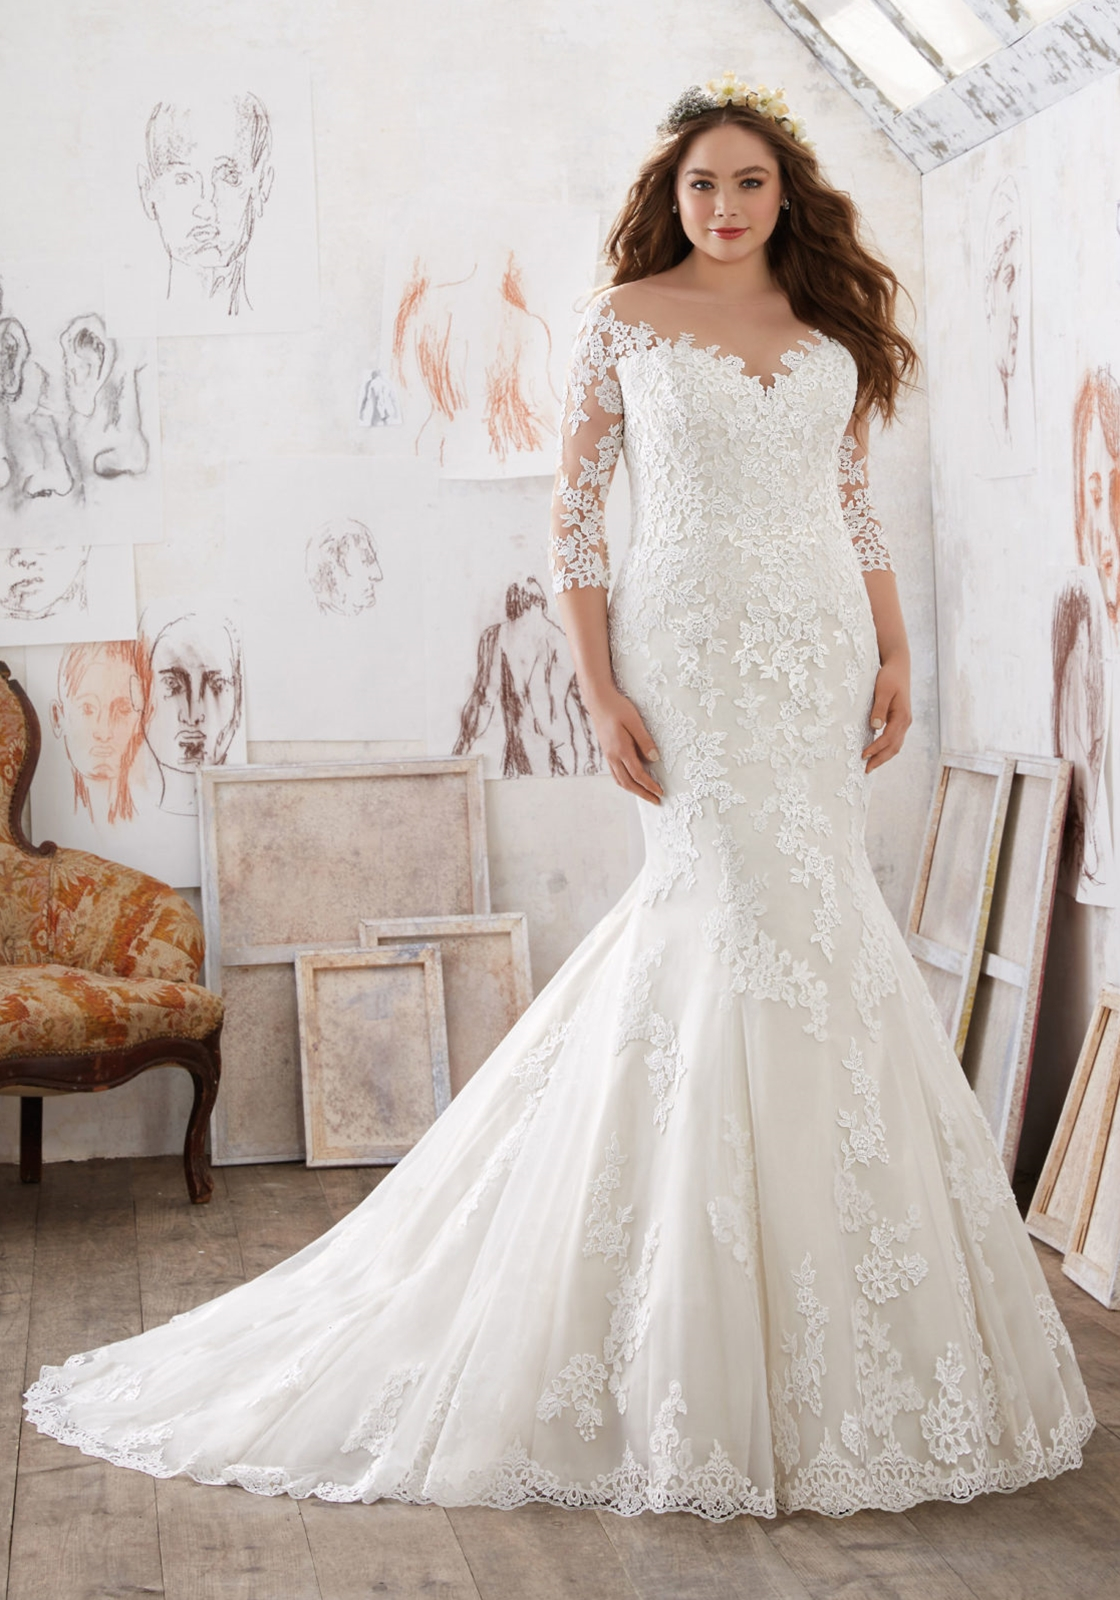 Julietta By Mori Lee Wedding Dress Style 3212 Mia